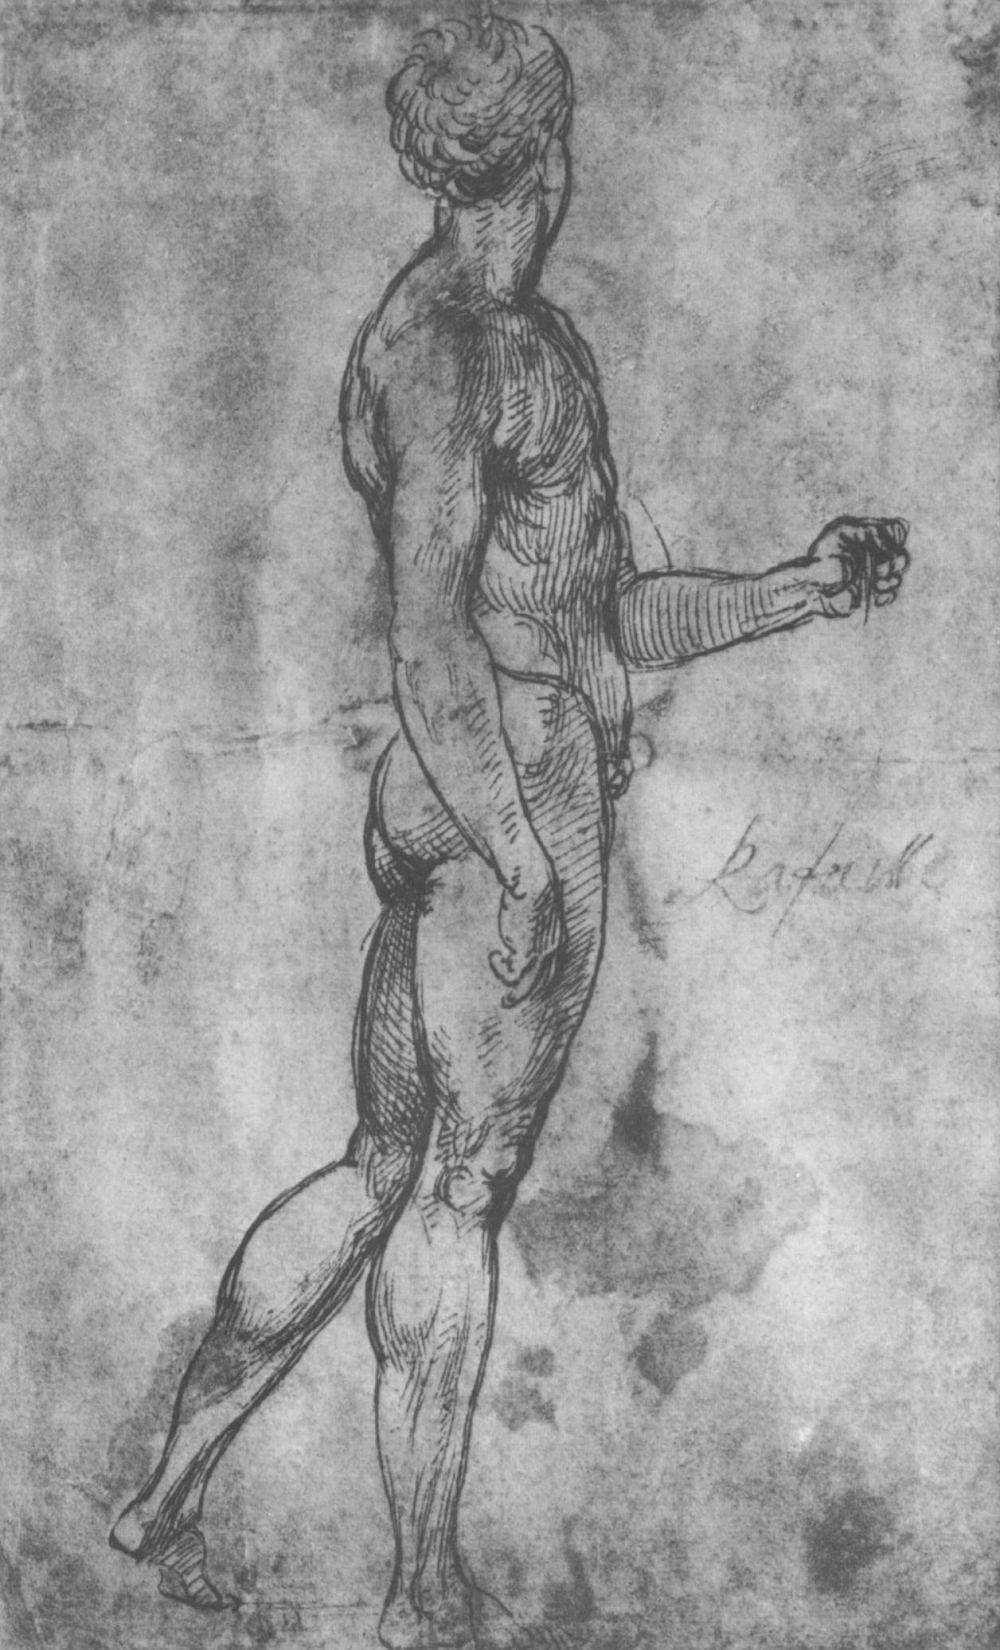 Raphael Sanzio. A naked man